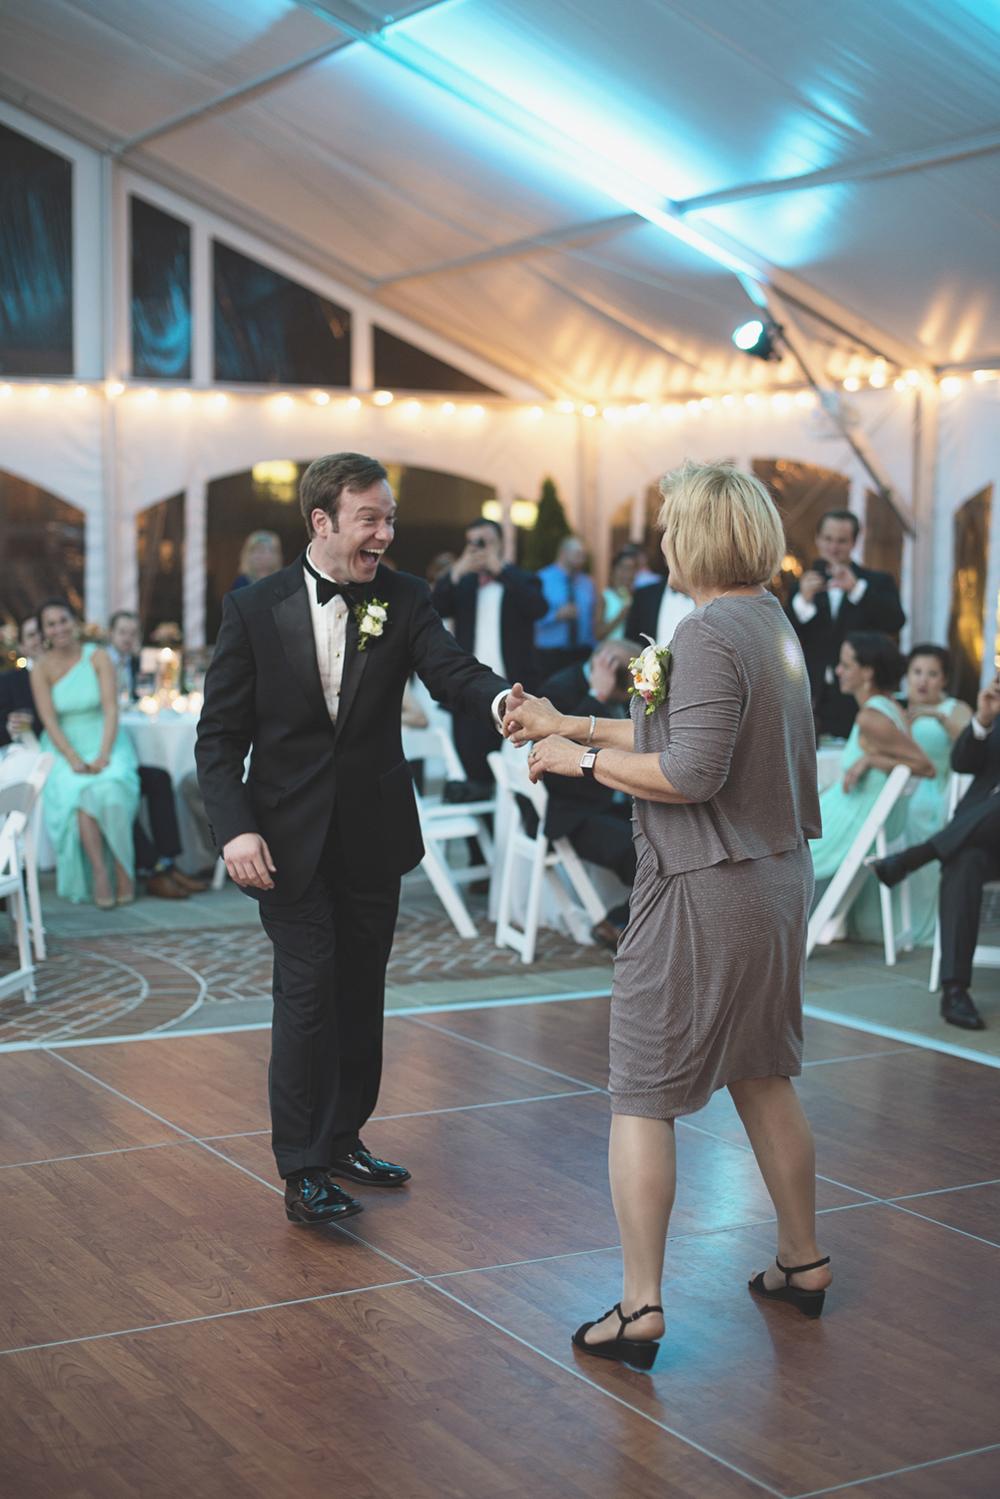 Inn at Warner Hall Wedding Photography | Reception guests dancing